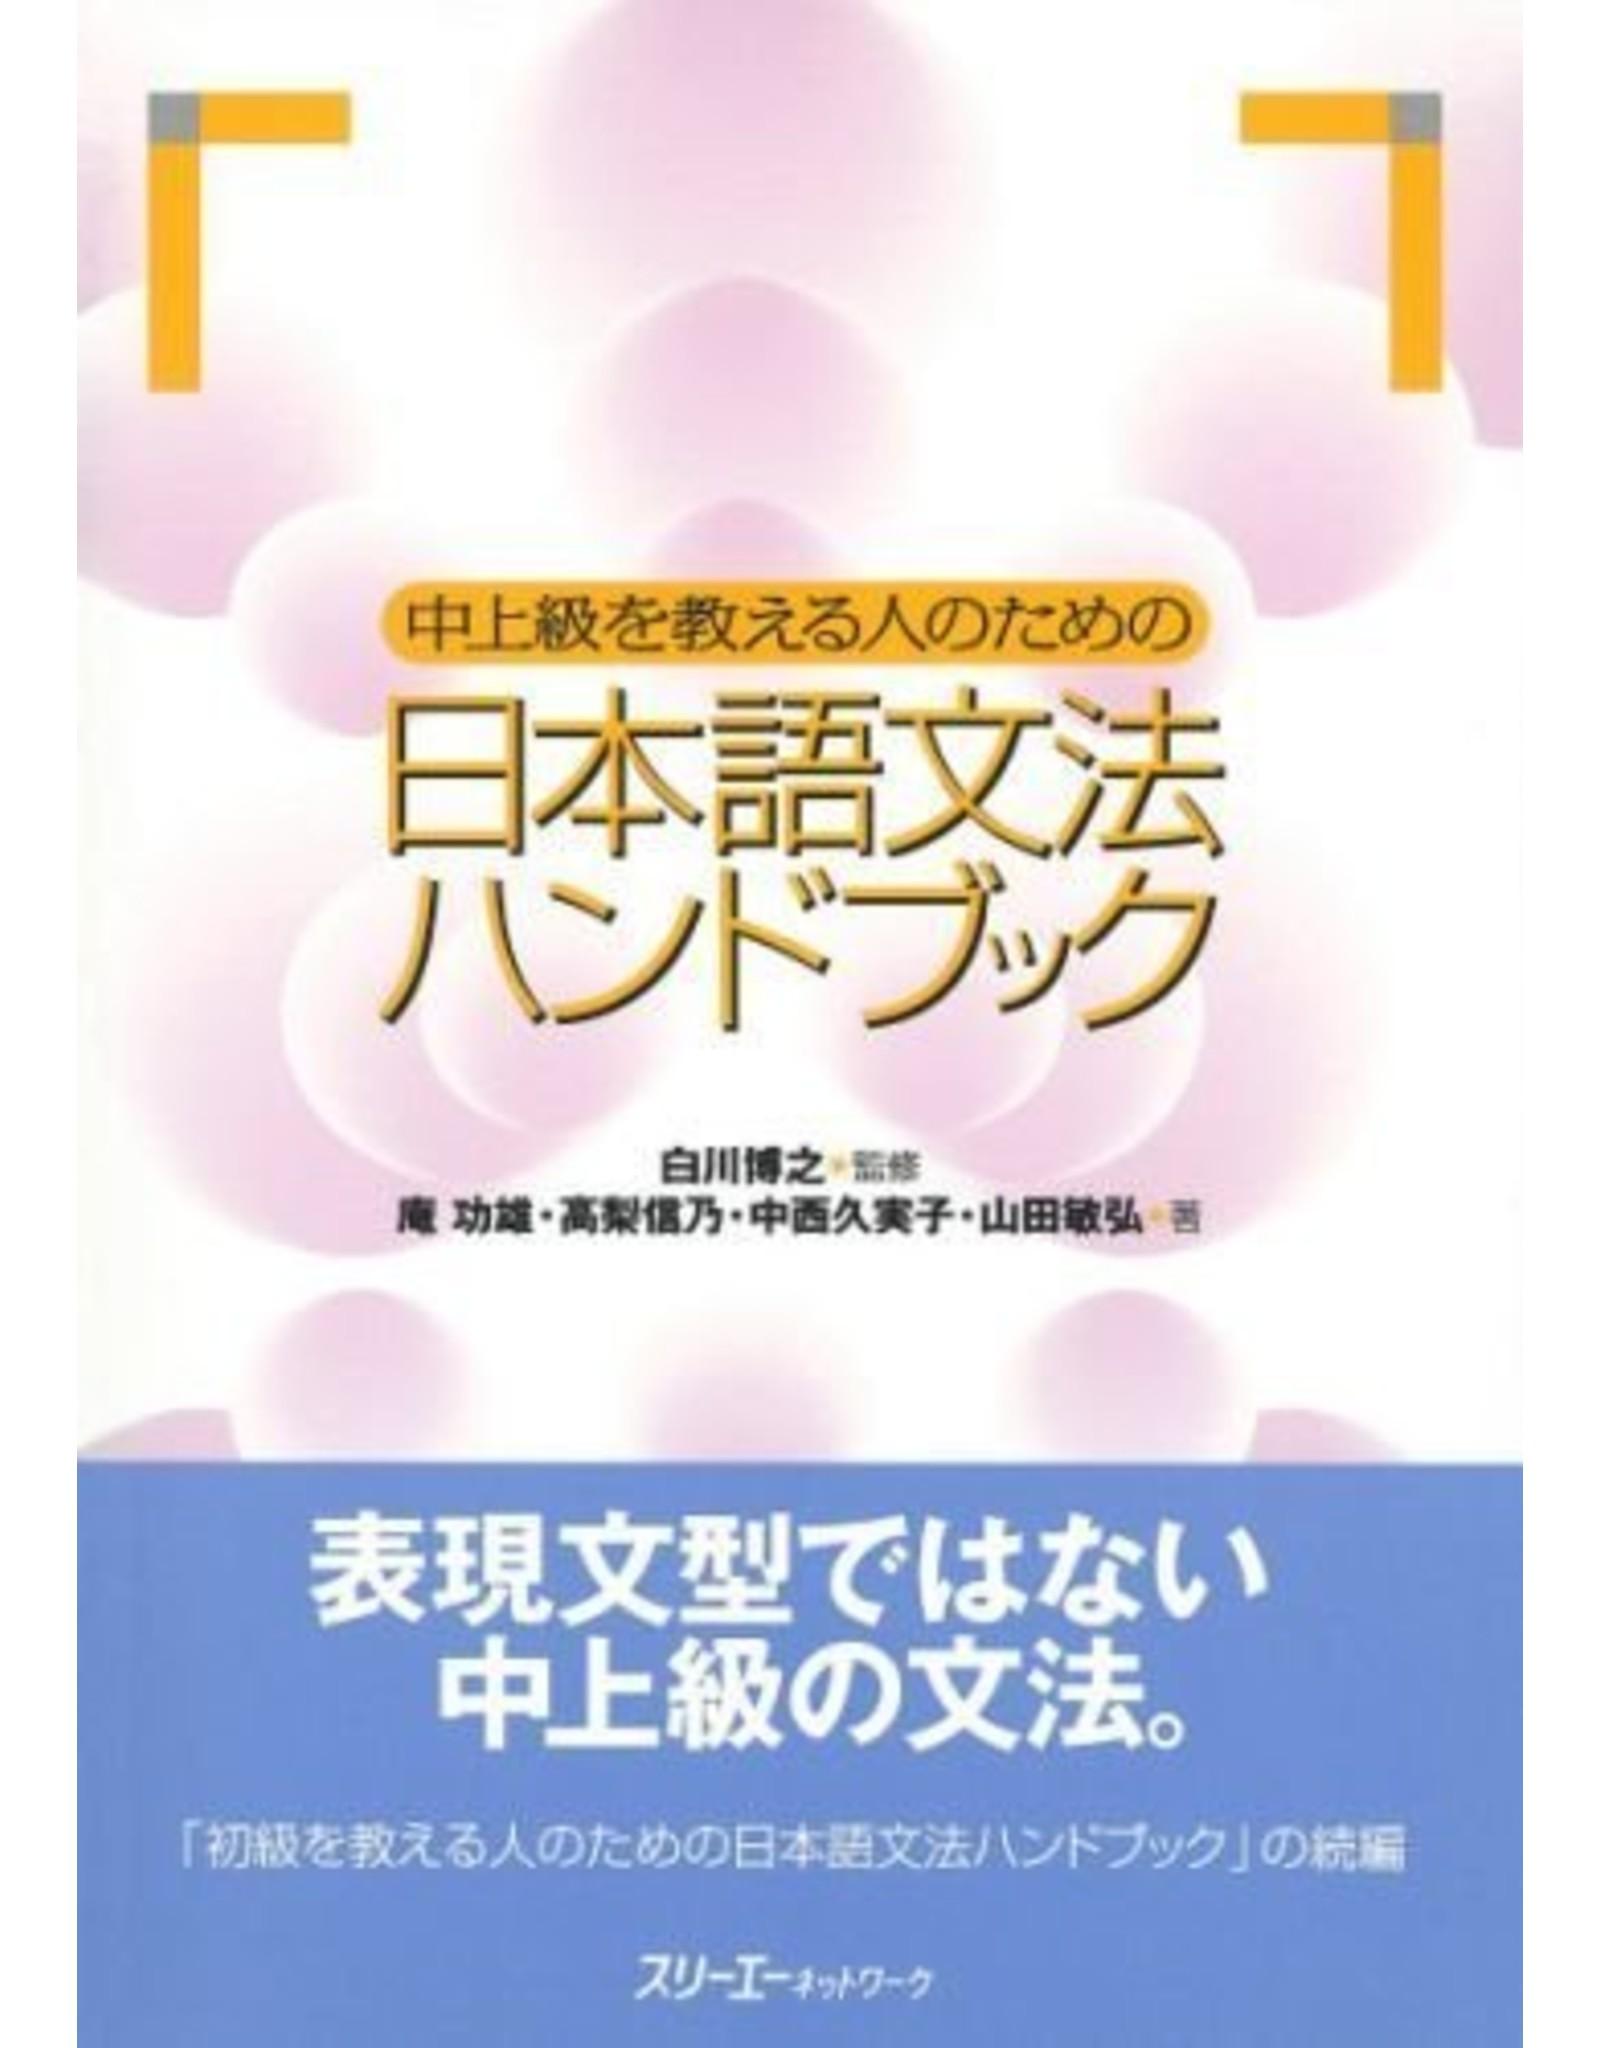 3A Corporation HANDBOOK OF JAPANESE GRAMMAR FOR TEACHERS OF INTERMEDIATE-ADVANCED STUDENTS